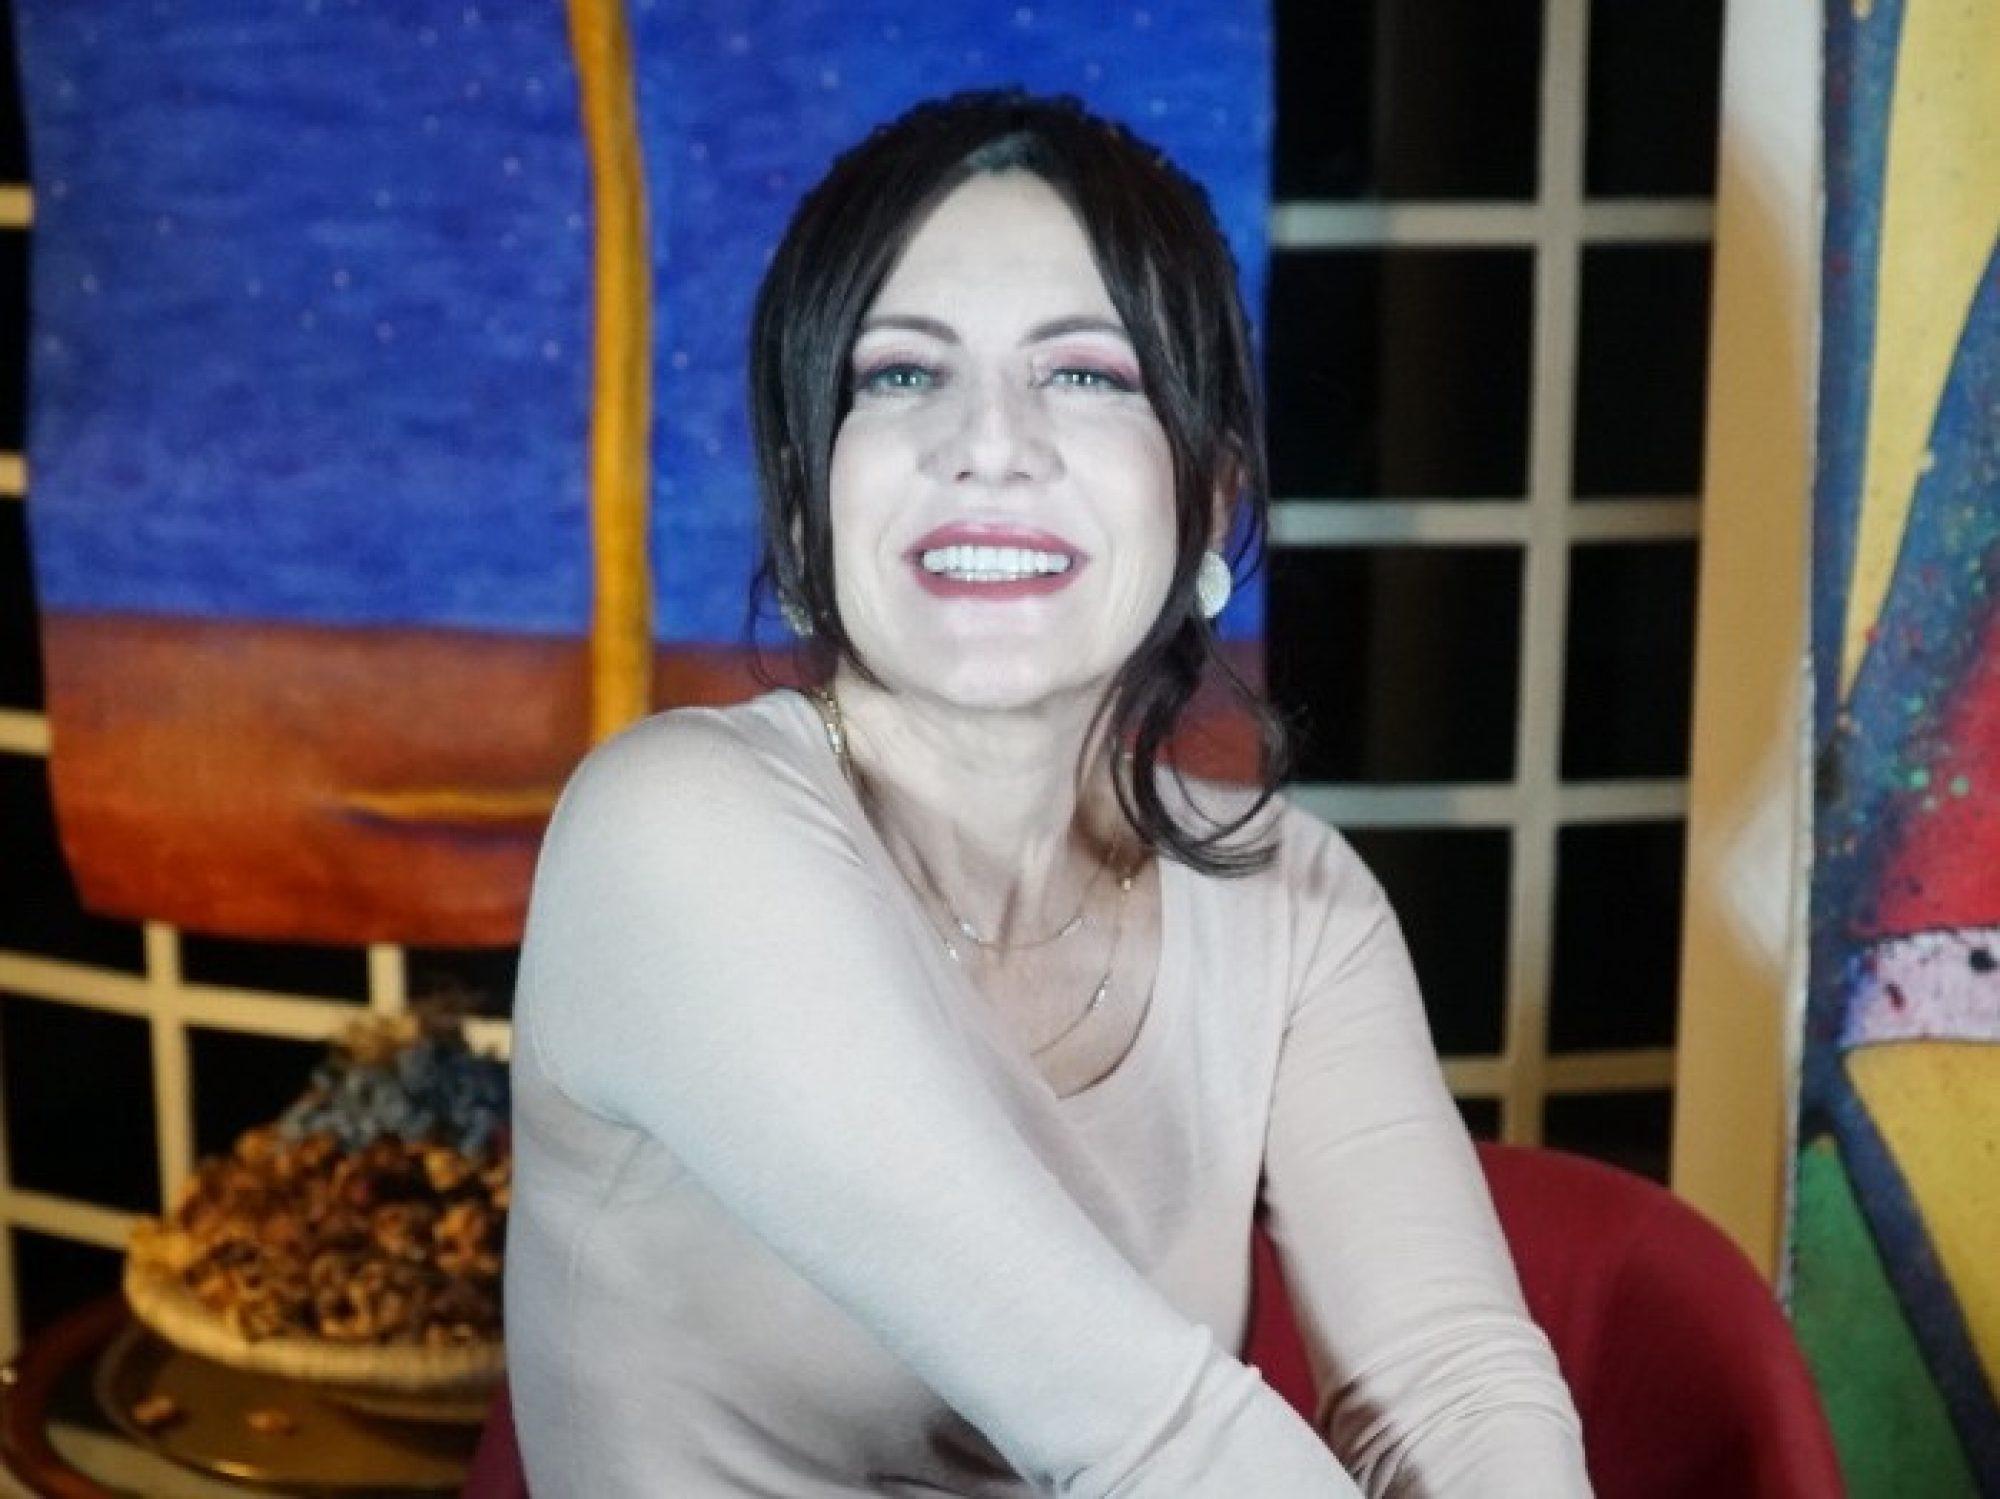 Serena Ucelli di Nemi